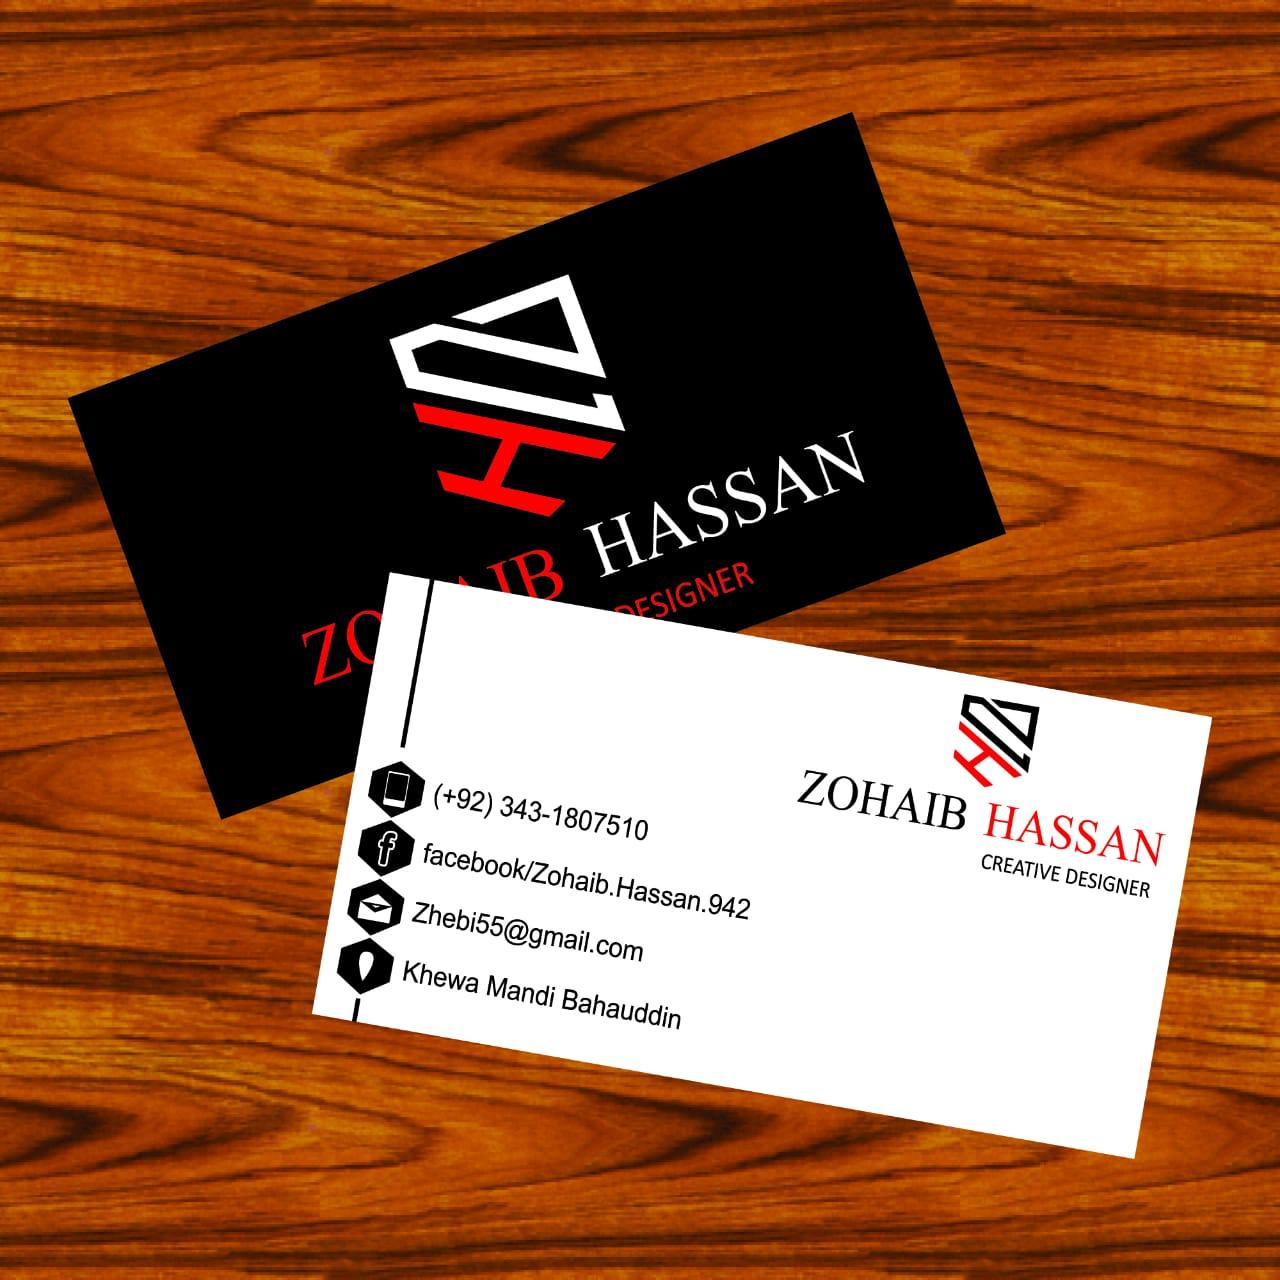 I'm a professional graphic and logo designer